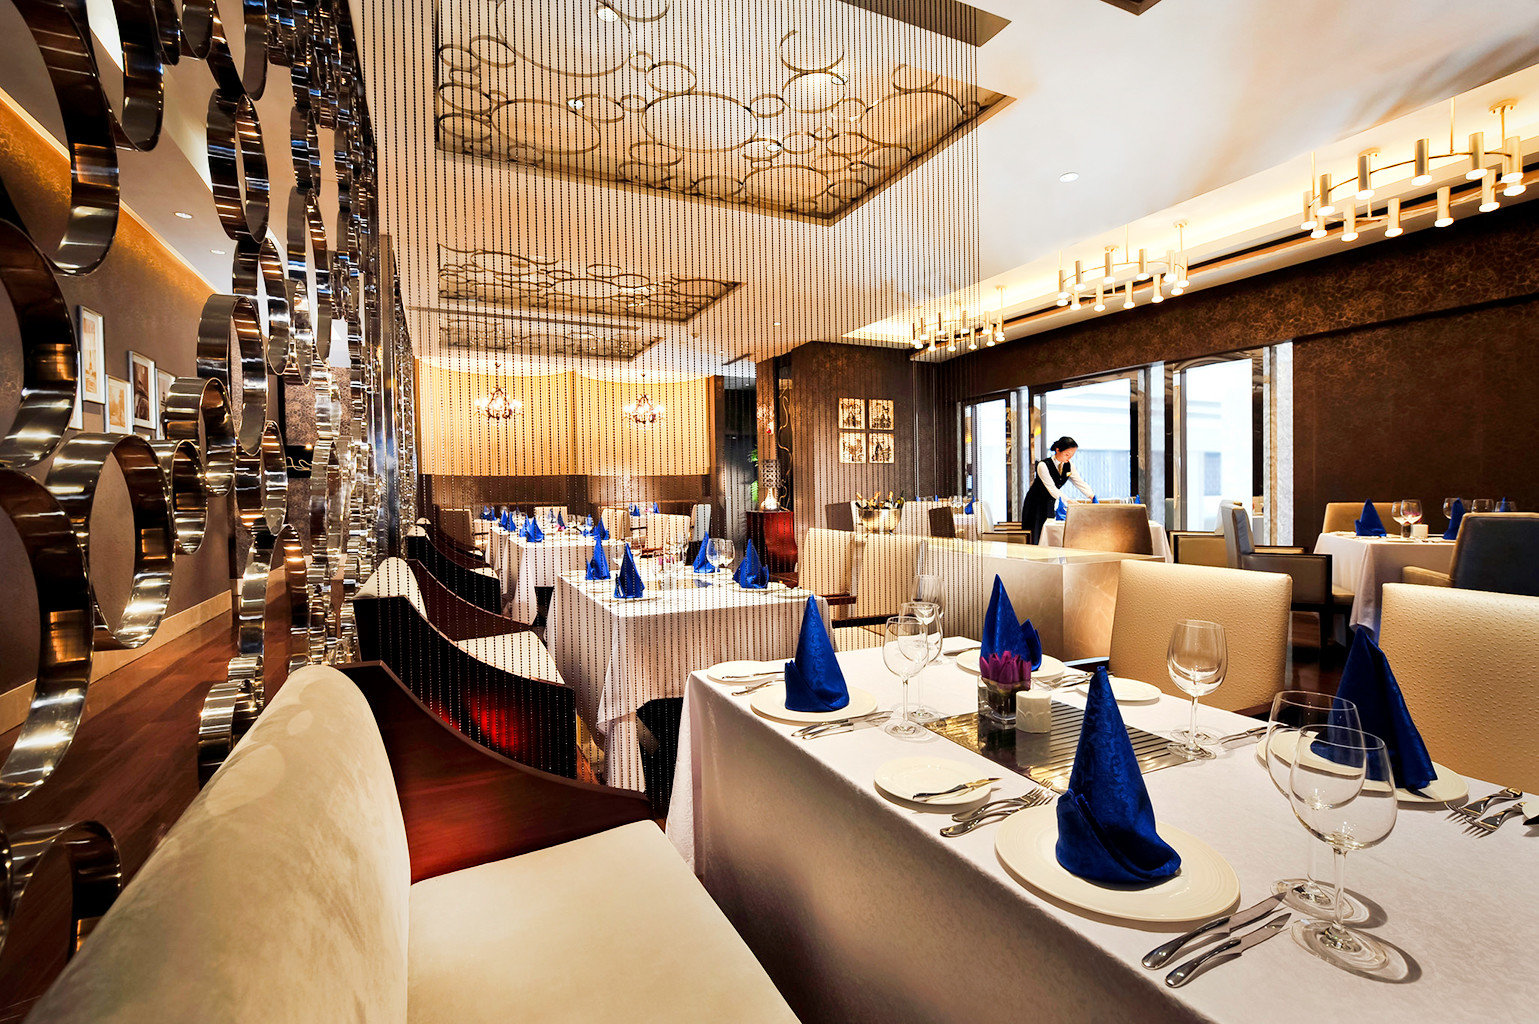 Classic Dining Drink Eat Resort restaurant Lobby function hall